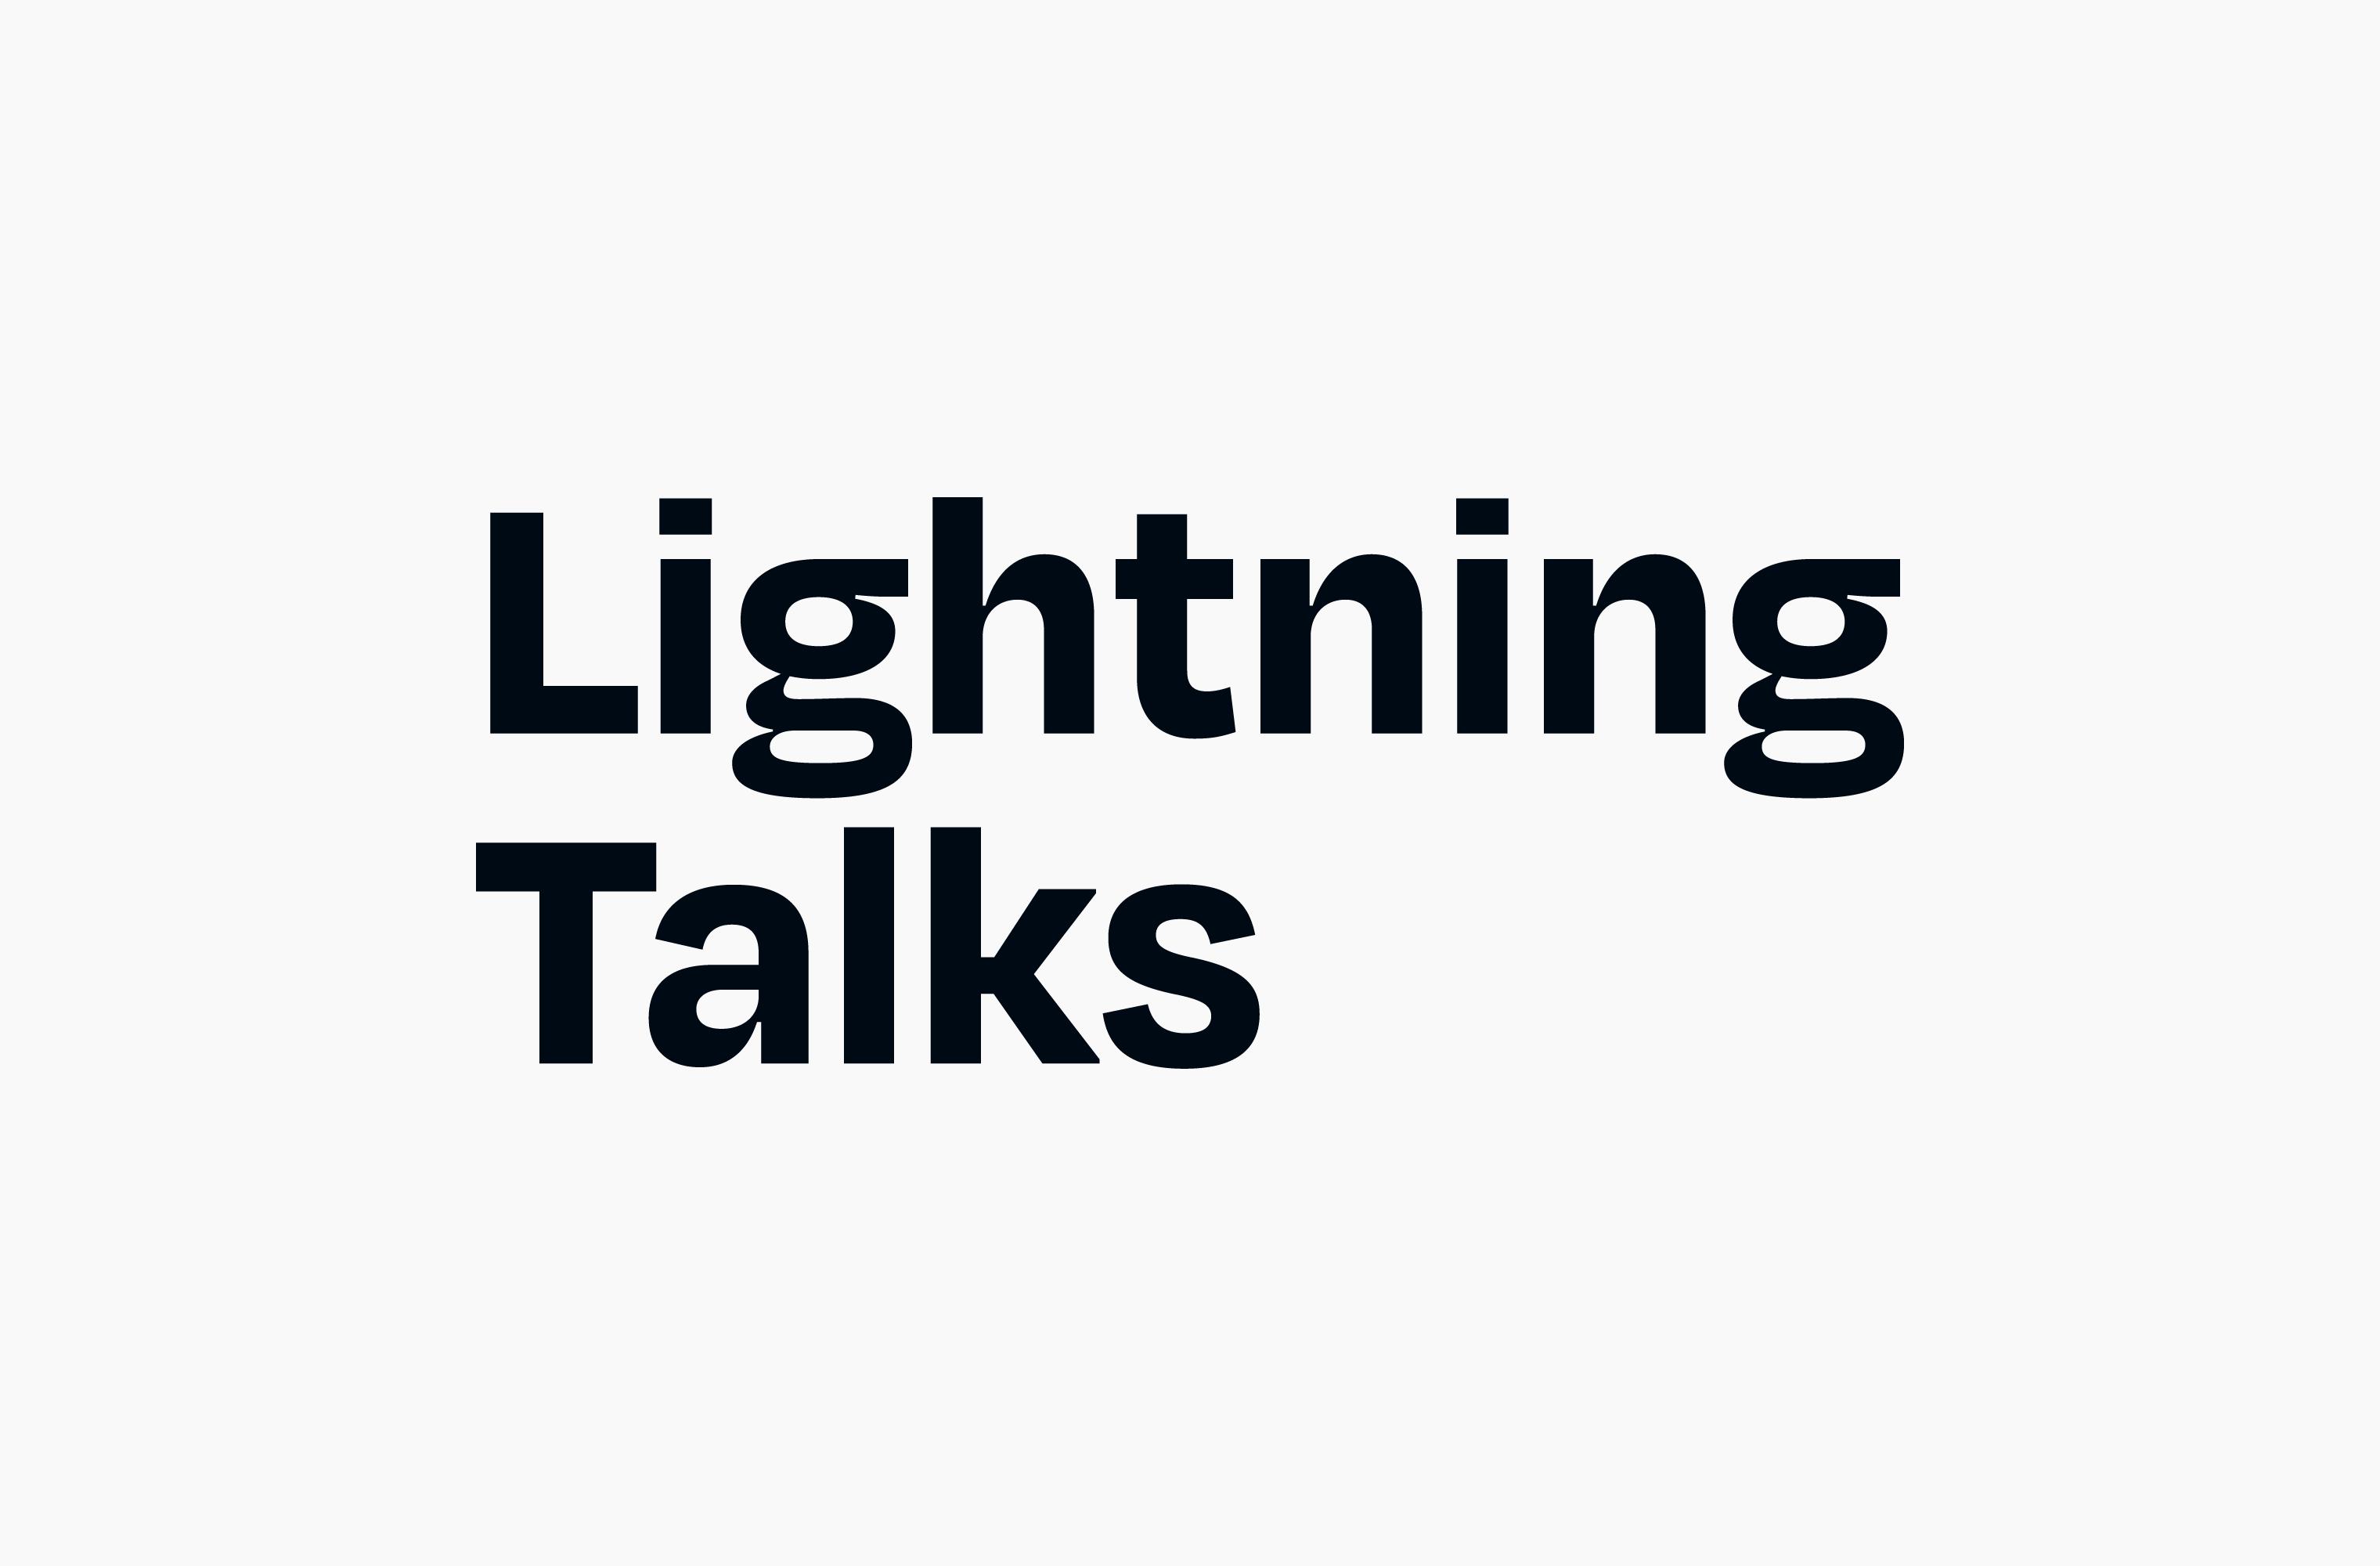 Black Lightning Talks wordmark on a white background